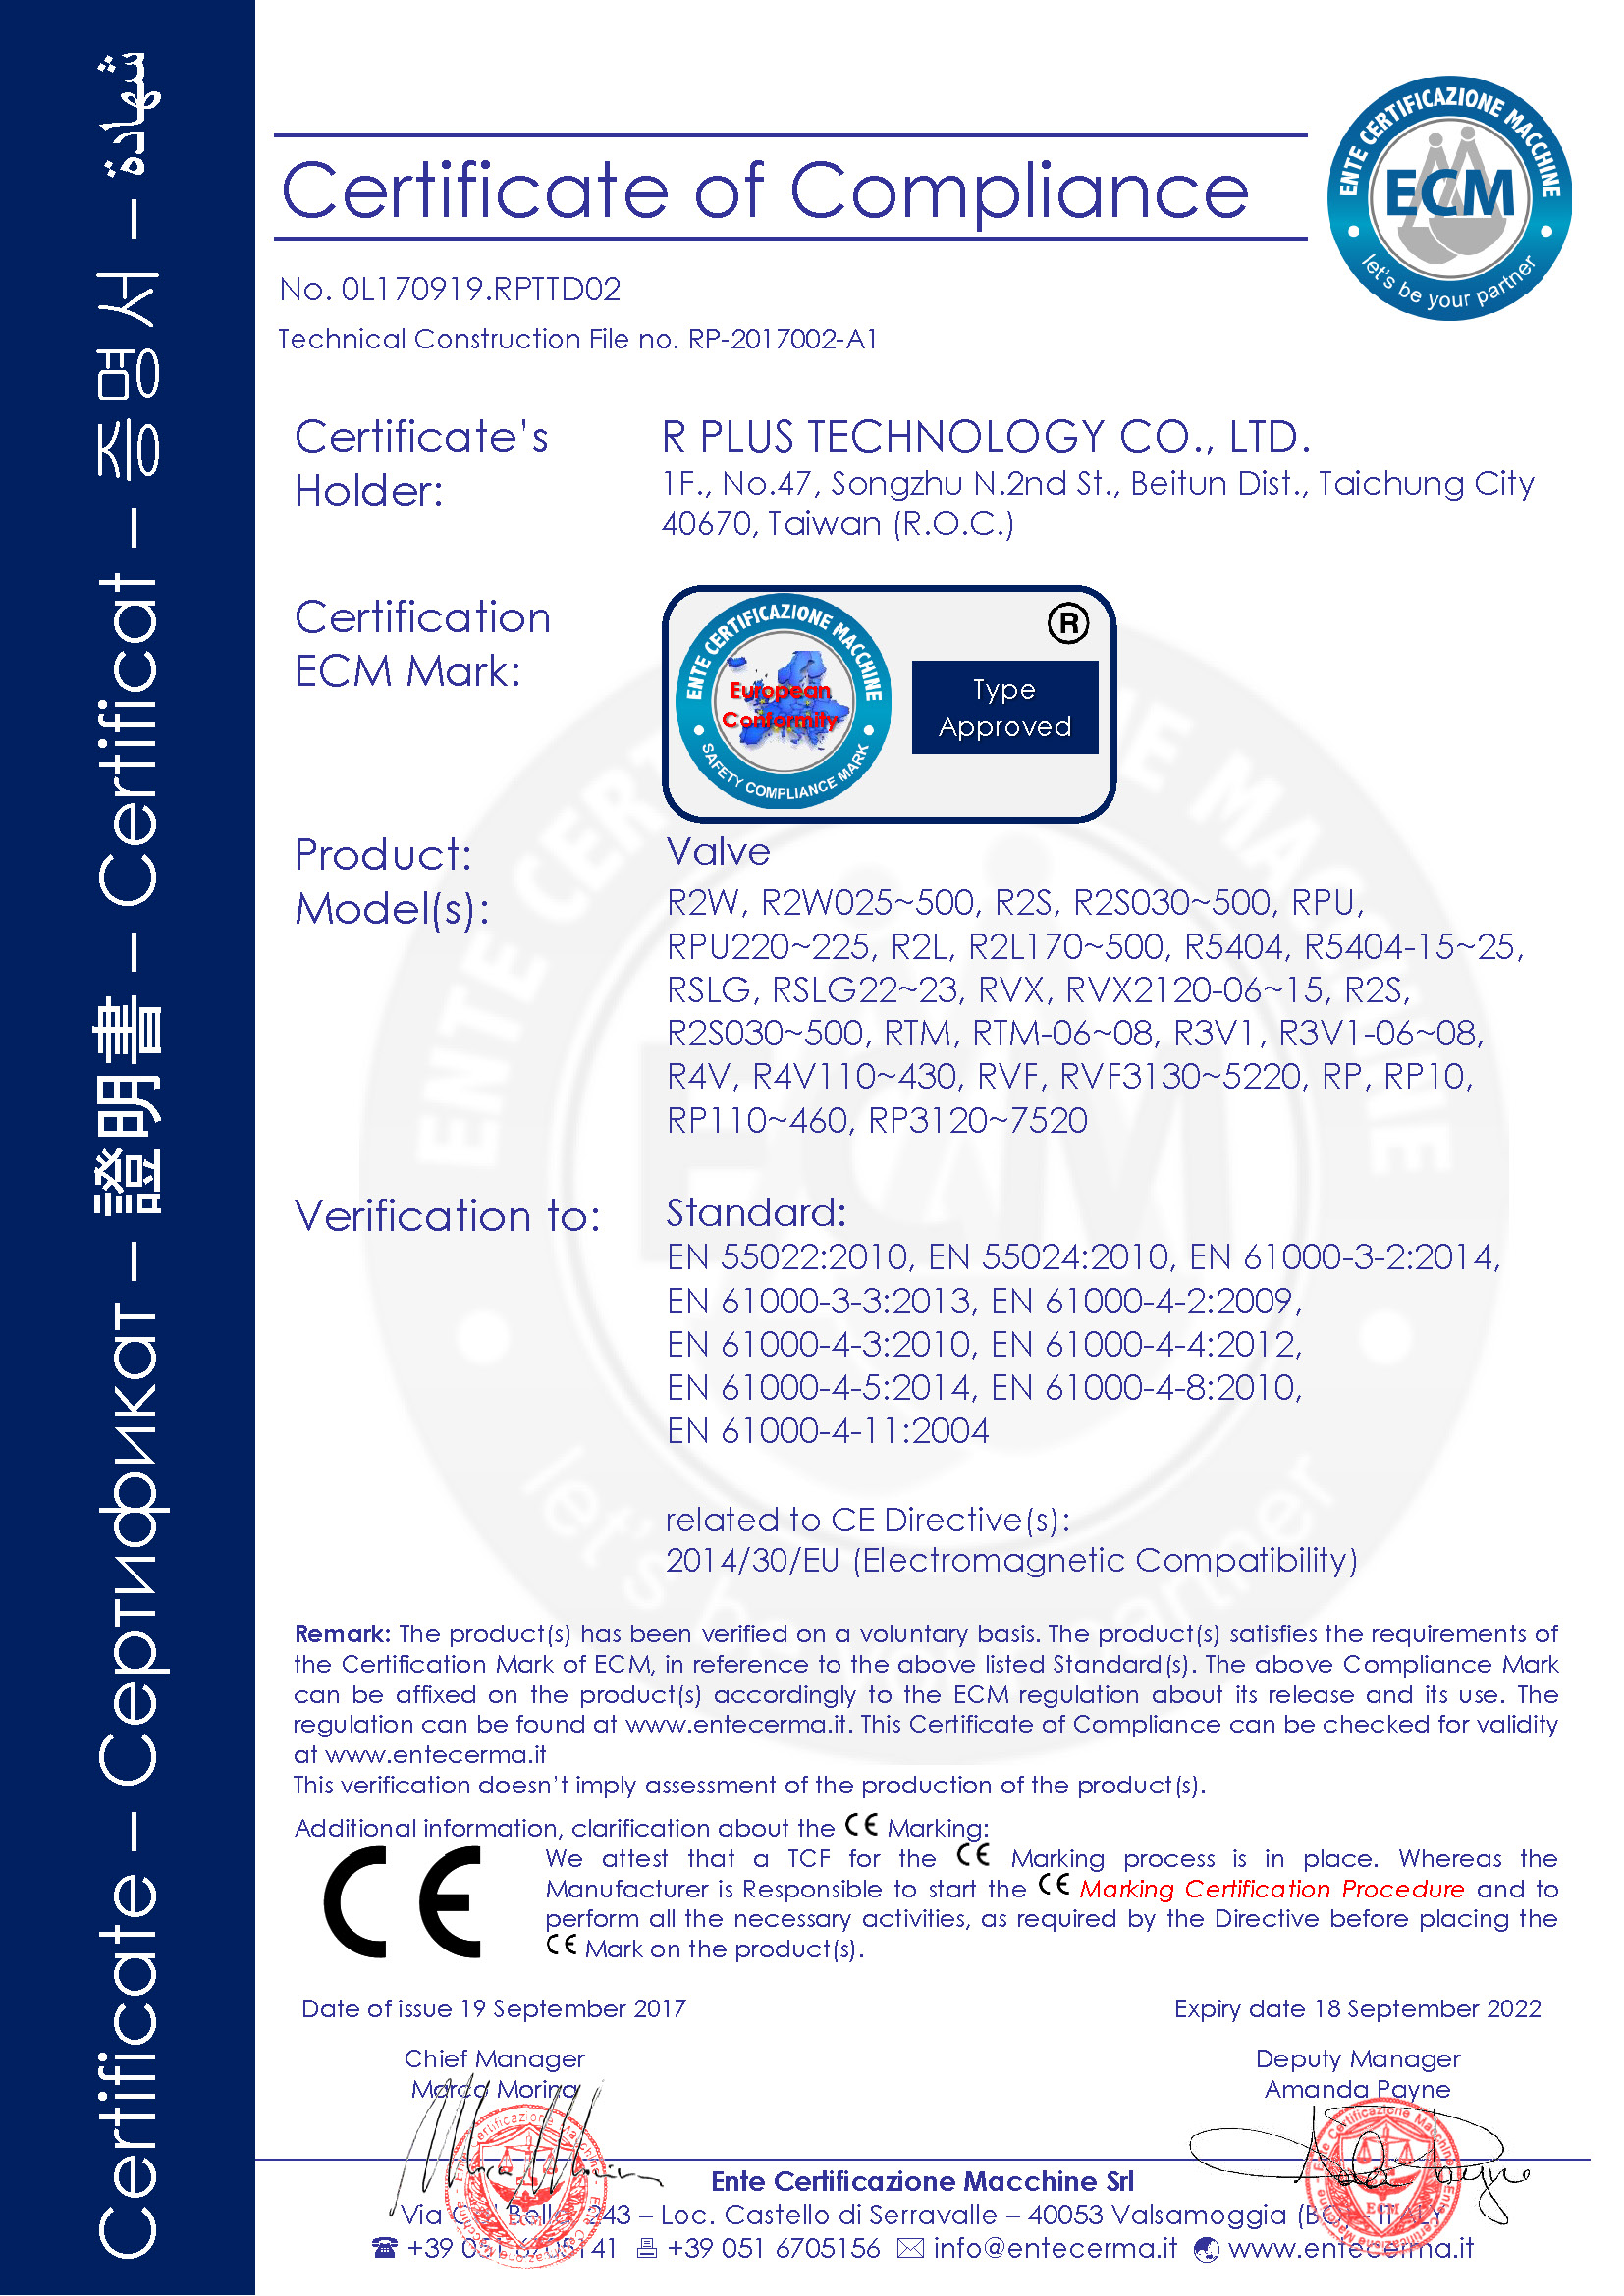 VALVE-CE證書(0L170919.RPTTD02).jpg